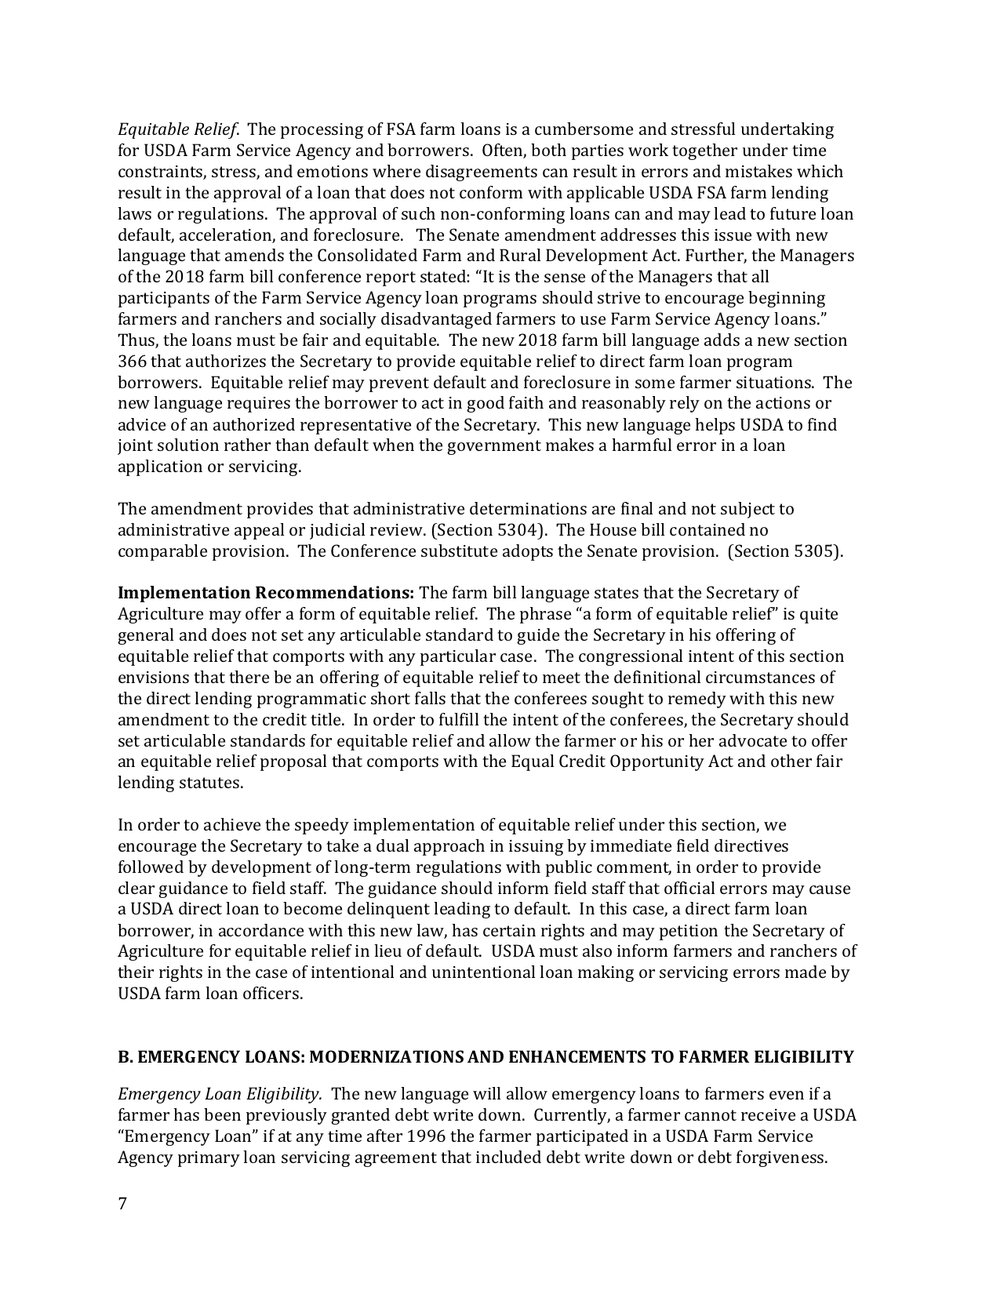 2018 Farm Bill Implementation Recommendations - Rural Co etal final March 1 page 8.jpg